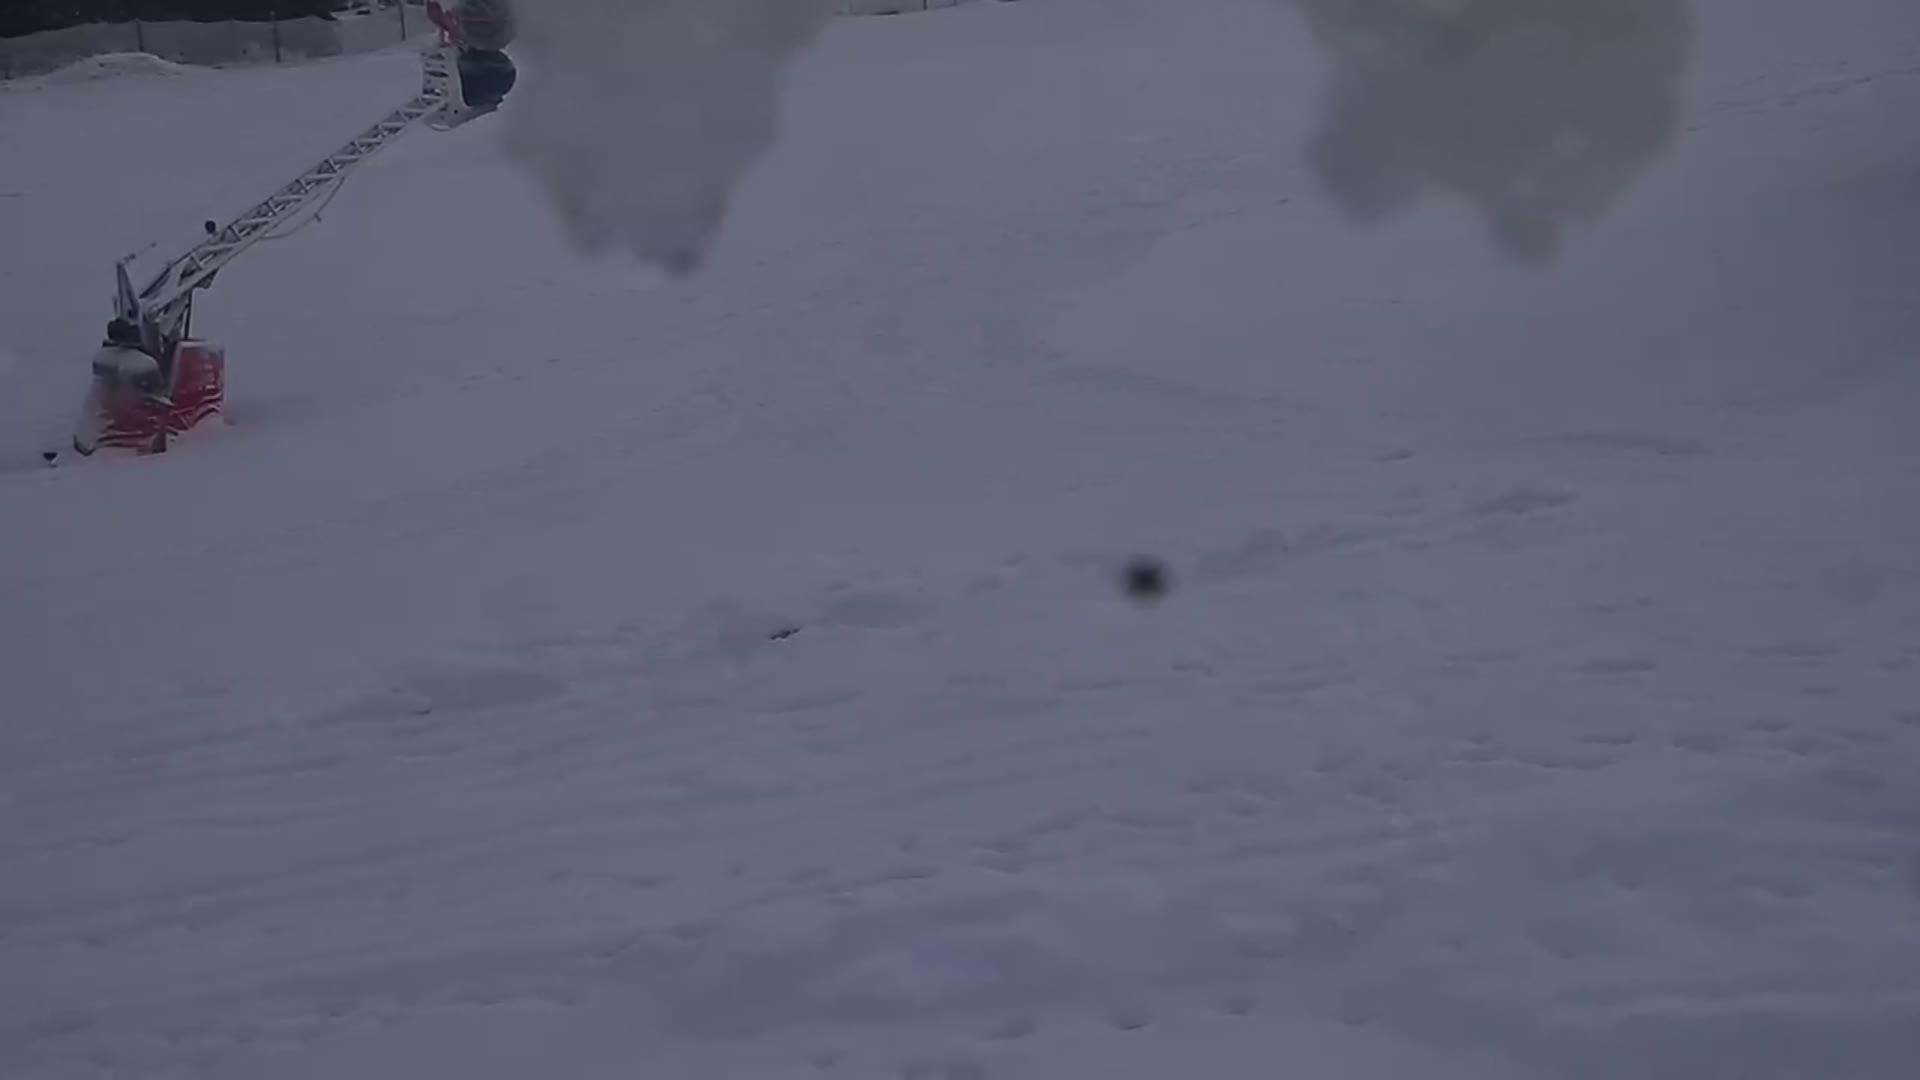 Webcam Skigebiet Czarna Gora cam 2 - Glatzer Schneegebirge